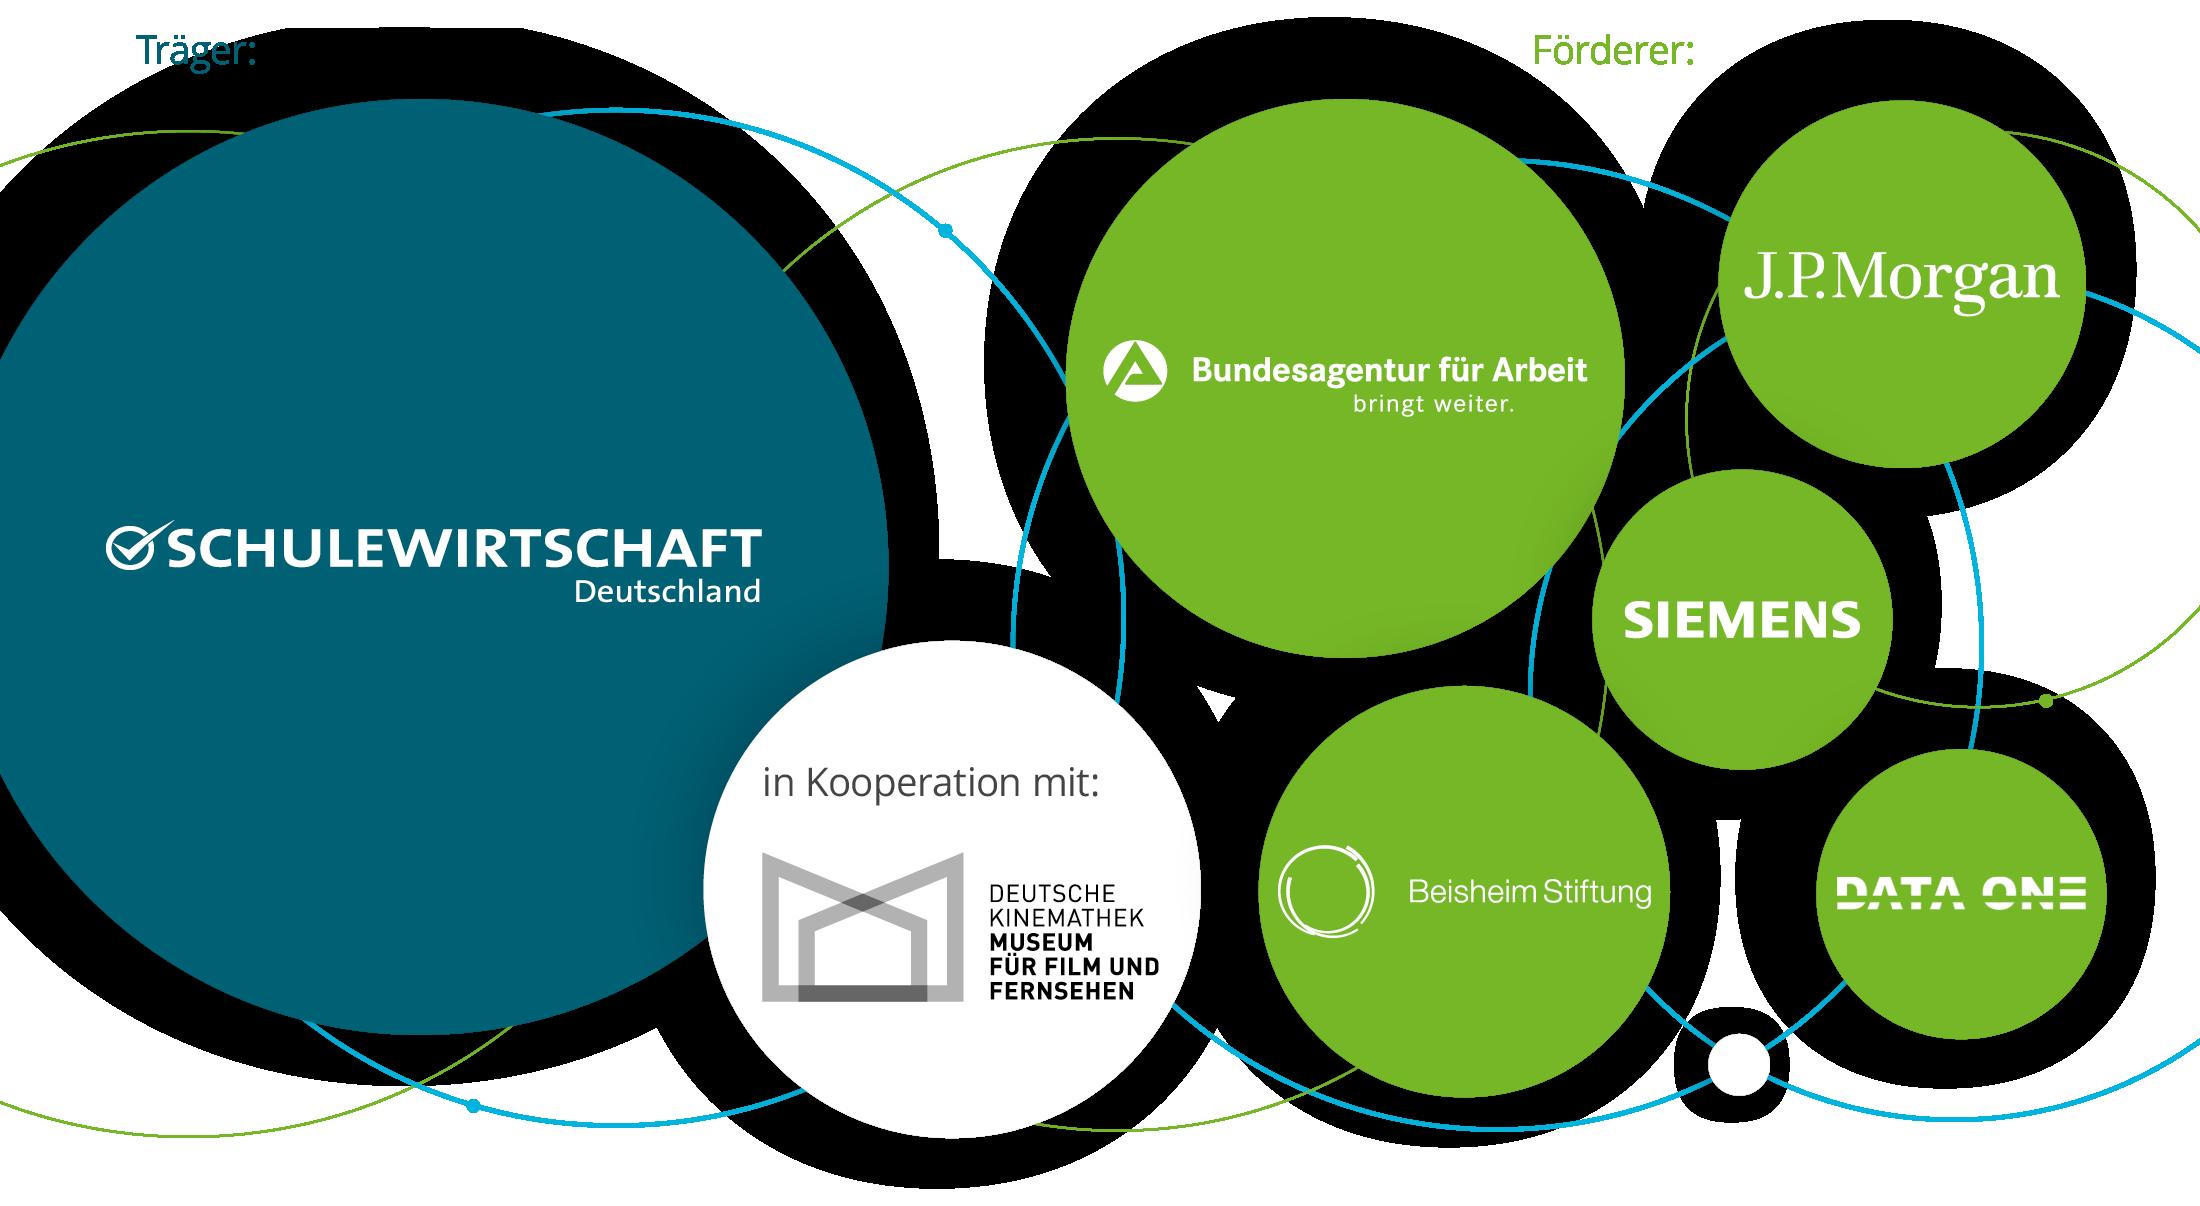 Netzwerktag-Footer-Logos